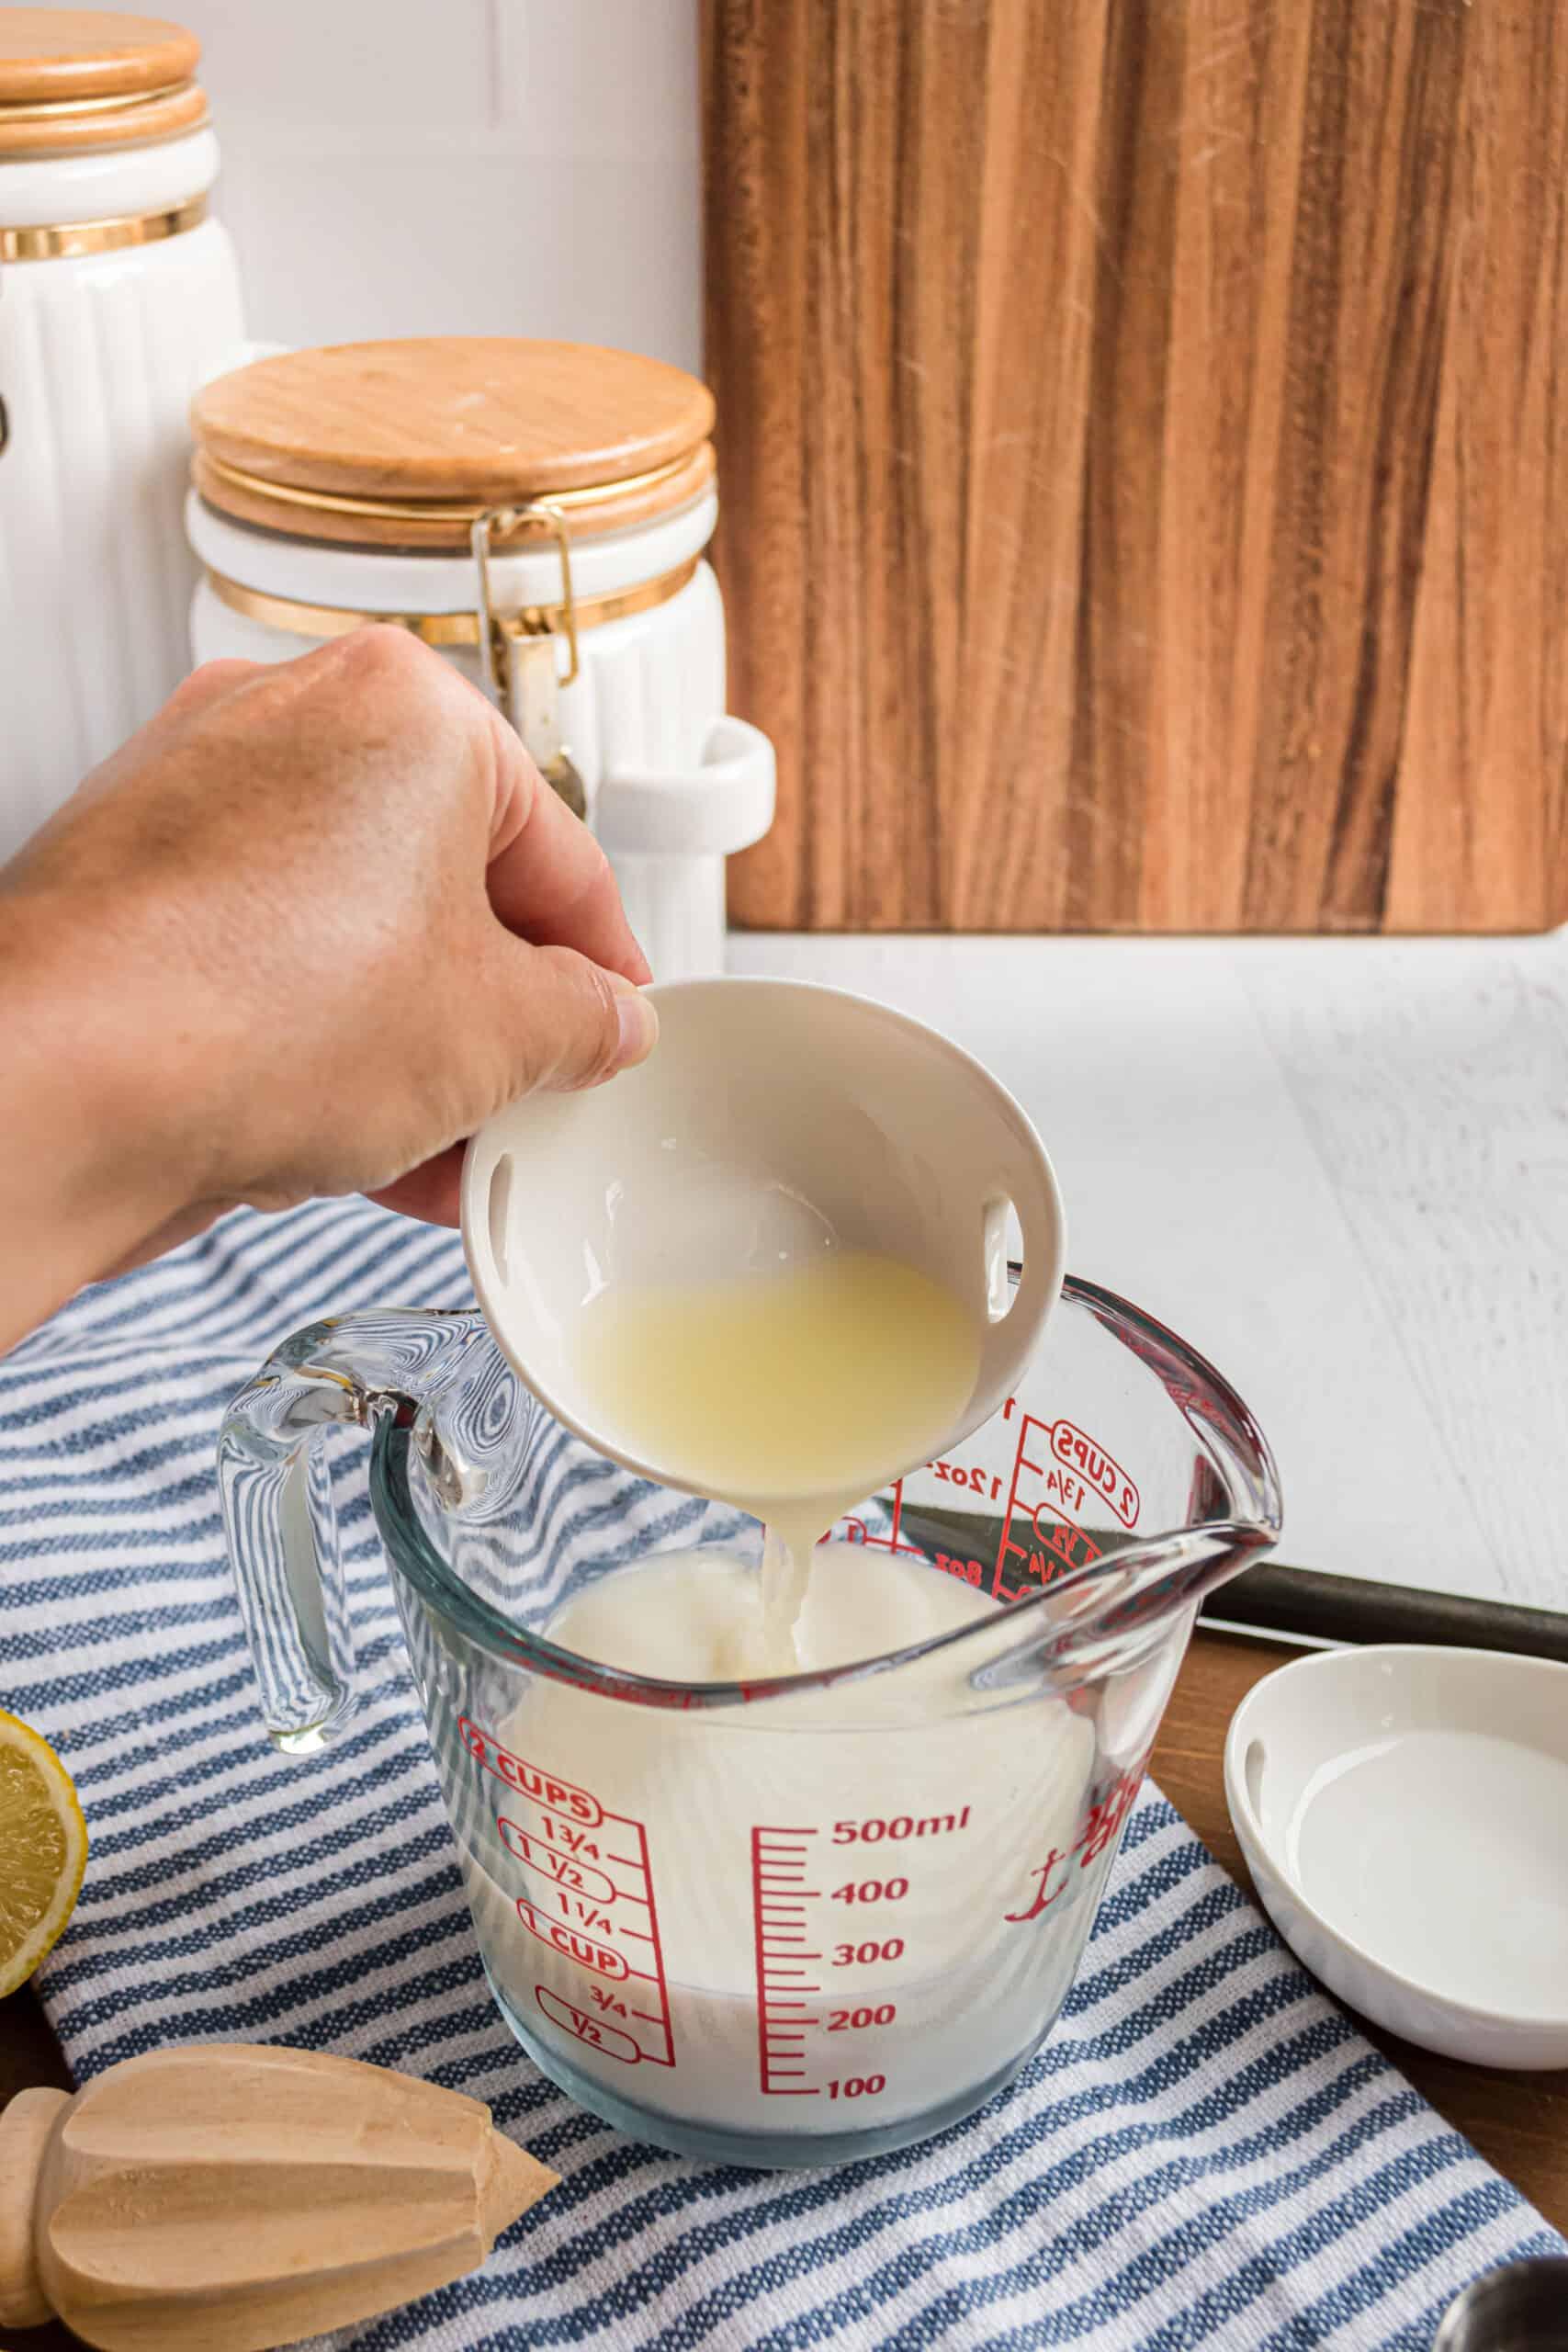 Add lemon juice to milk to create a buttermilk substitute.